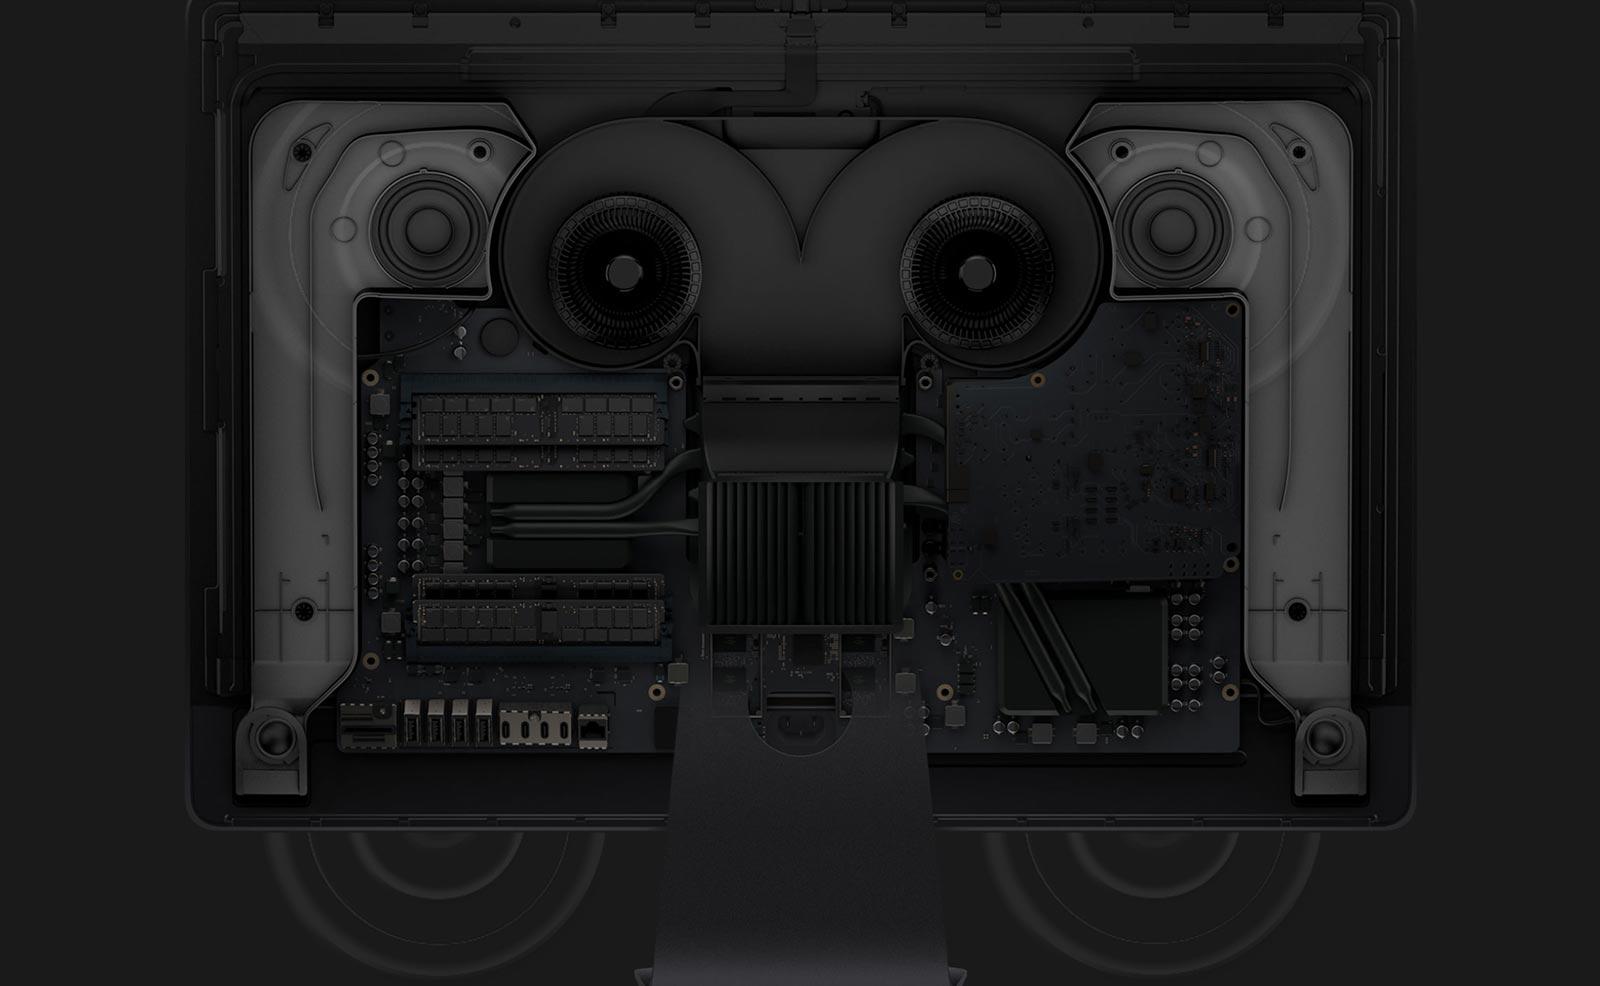 iMac Pro Accesorries